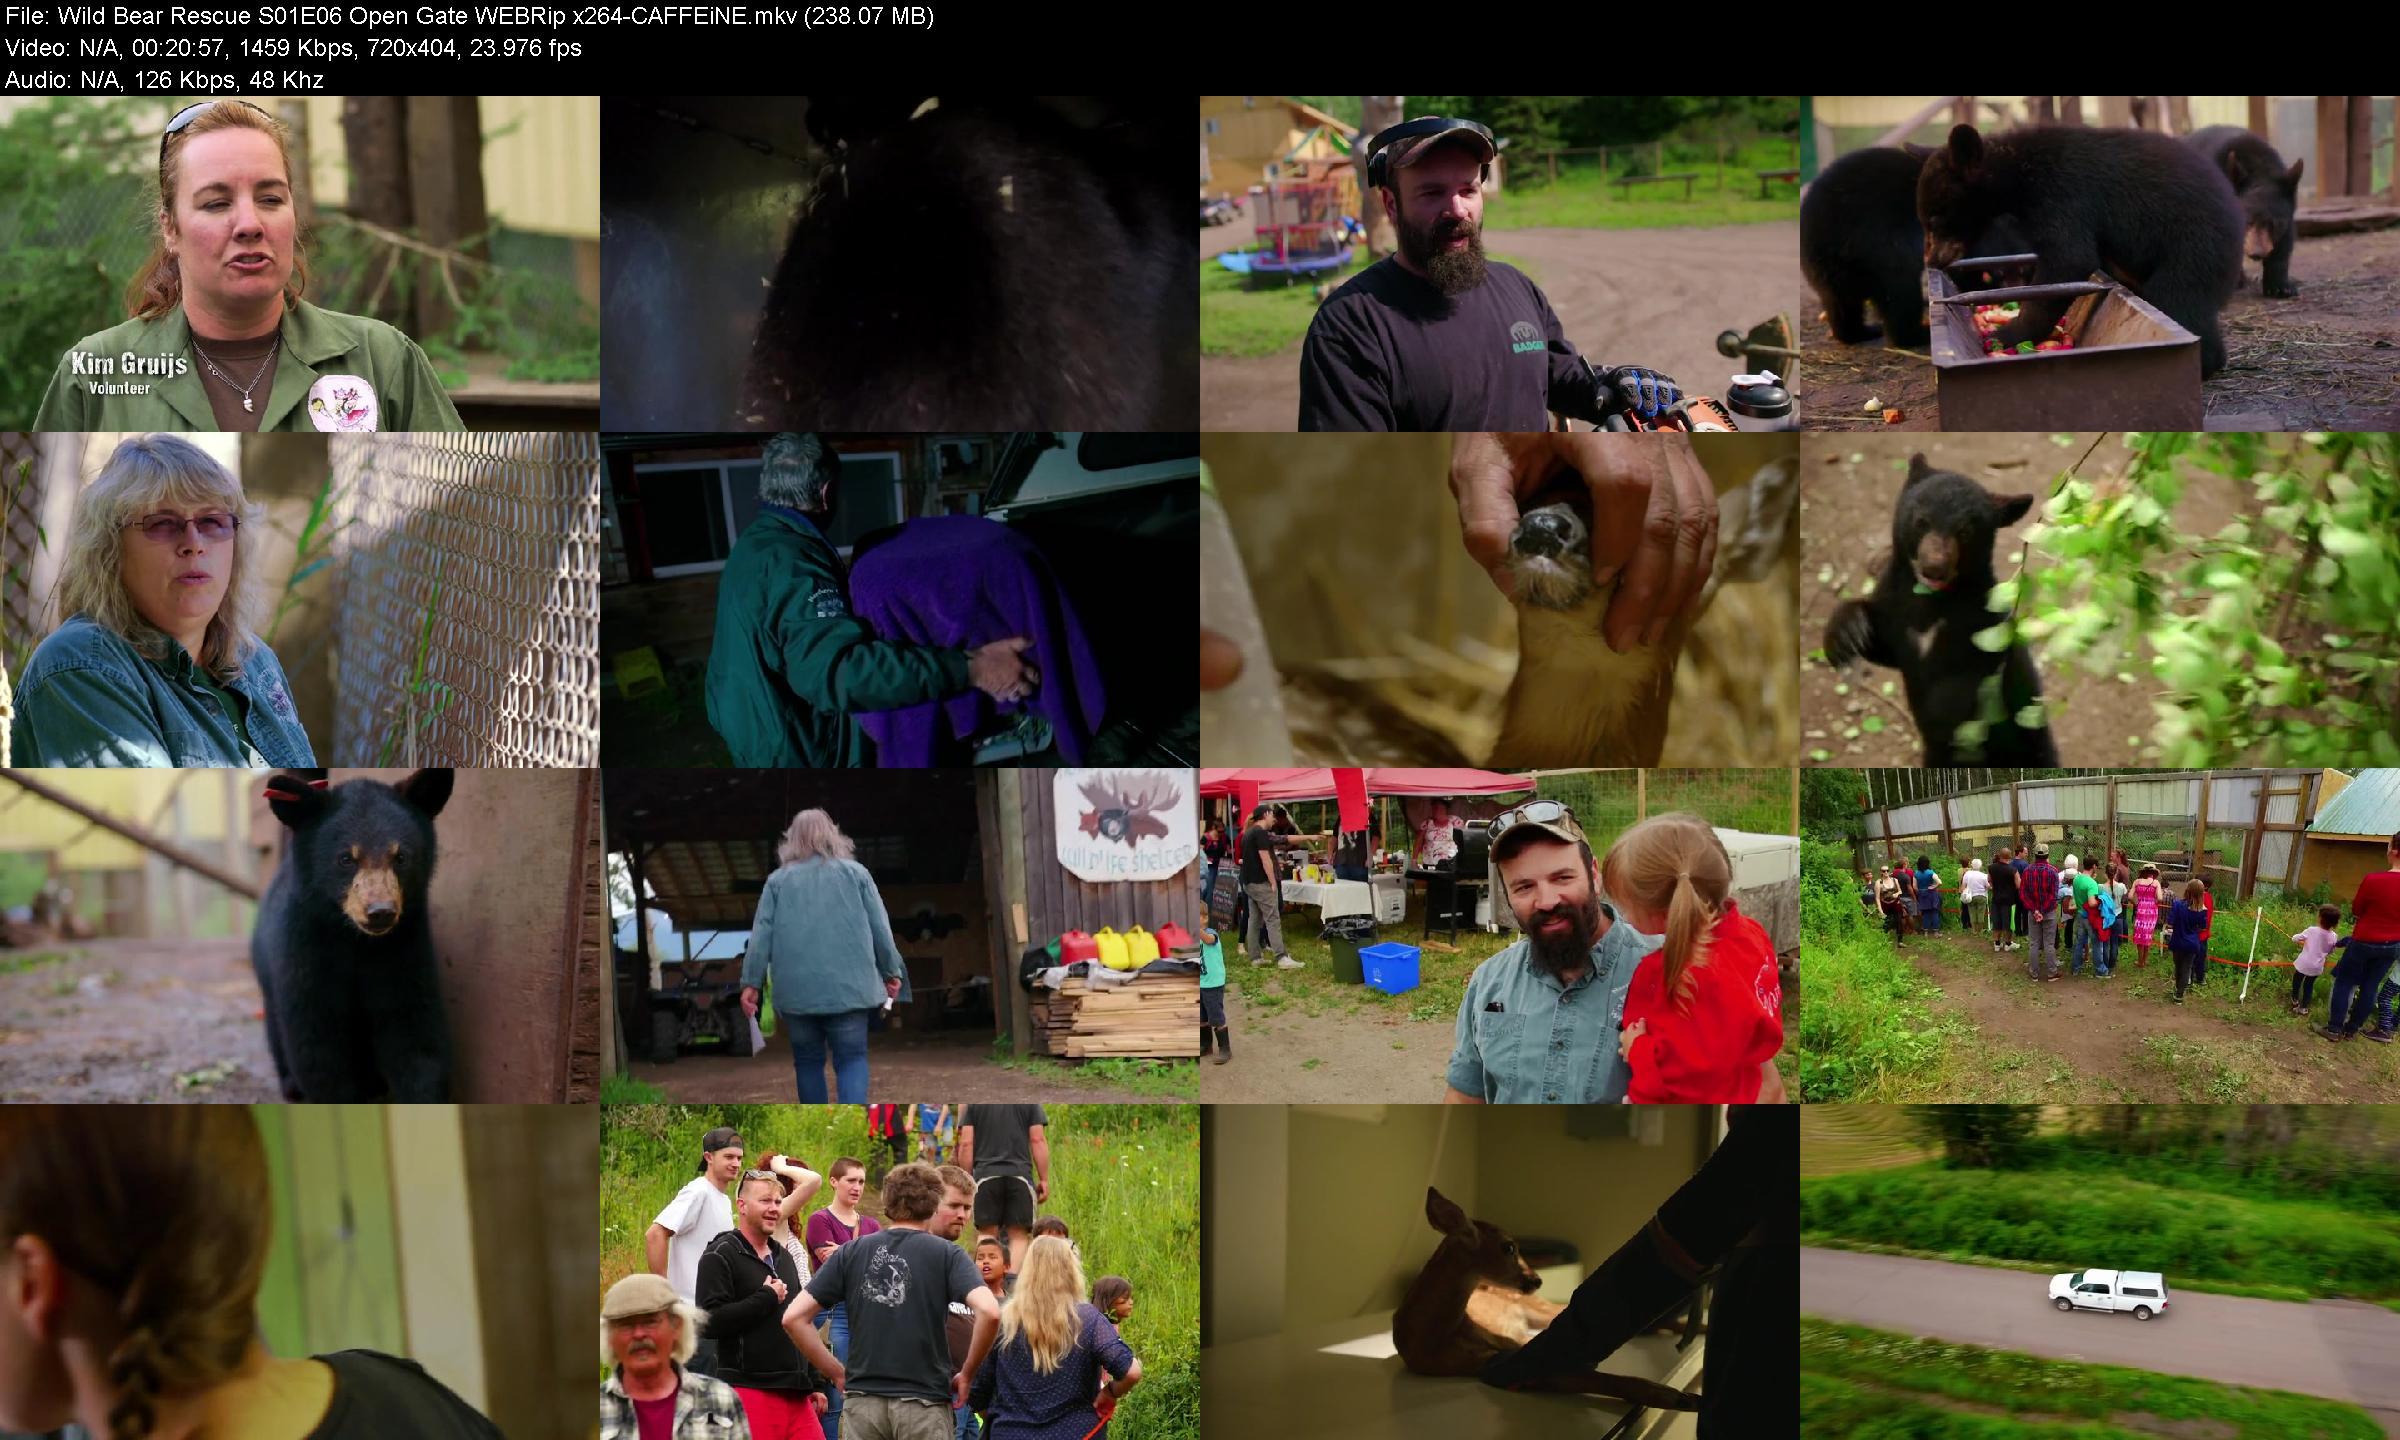 Wild Bear Rescue S01e06 Open Gate Webrip X264 caffeine